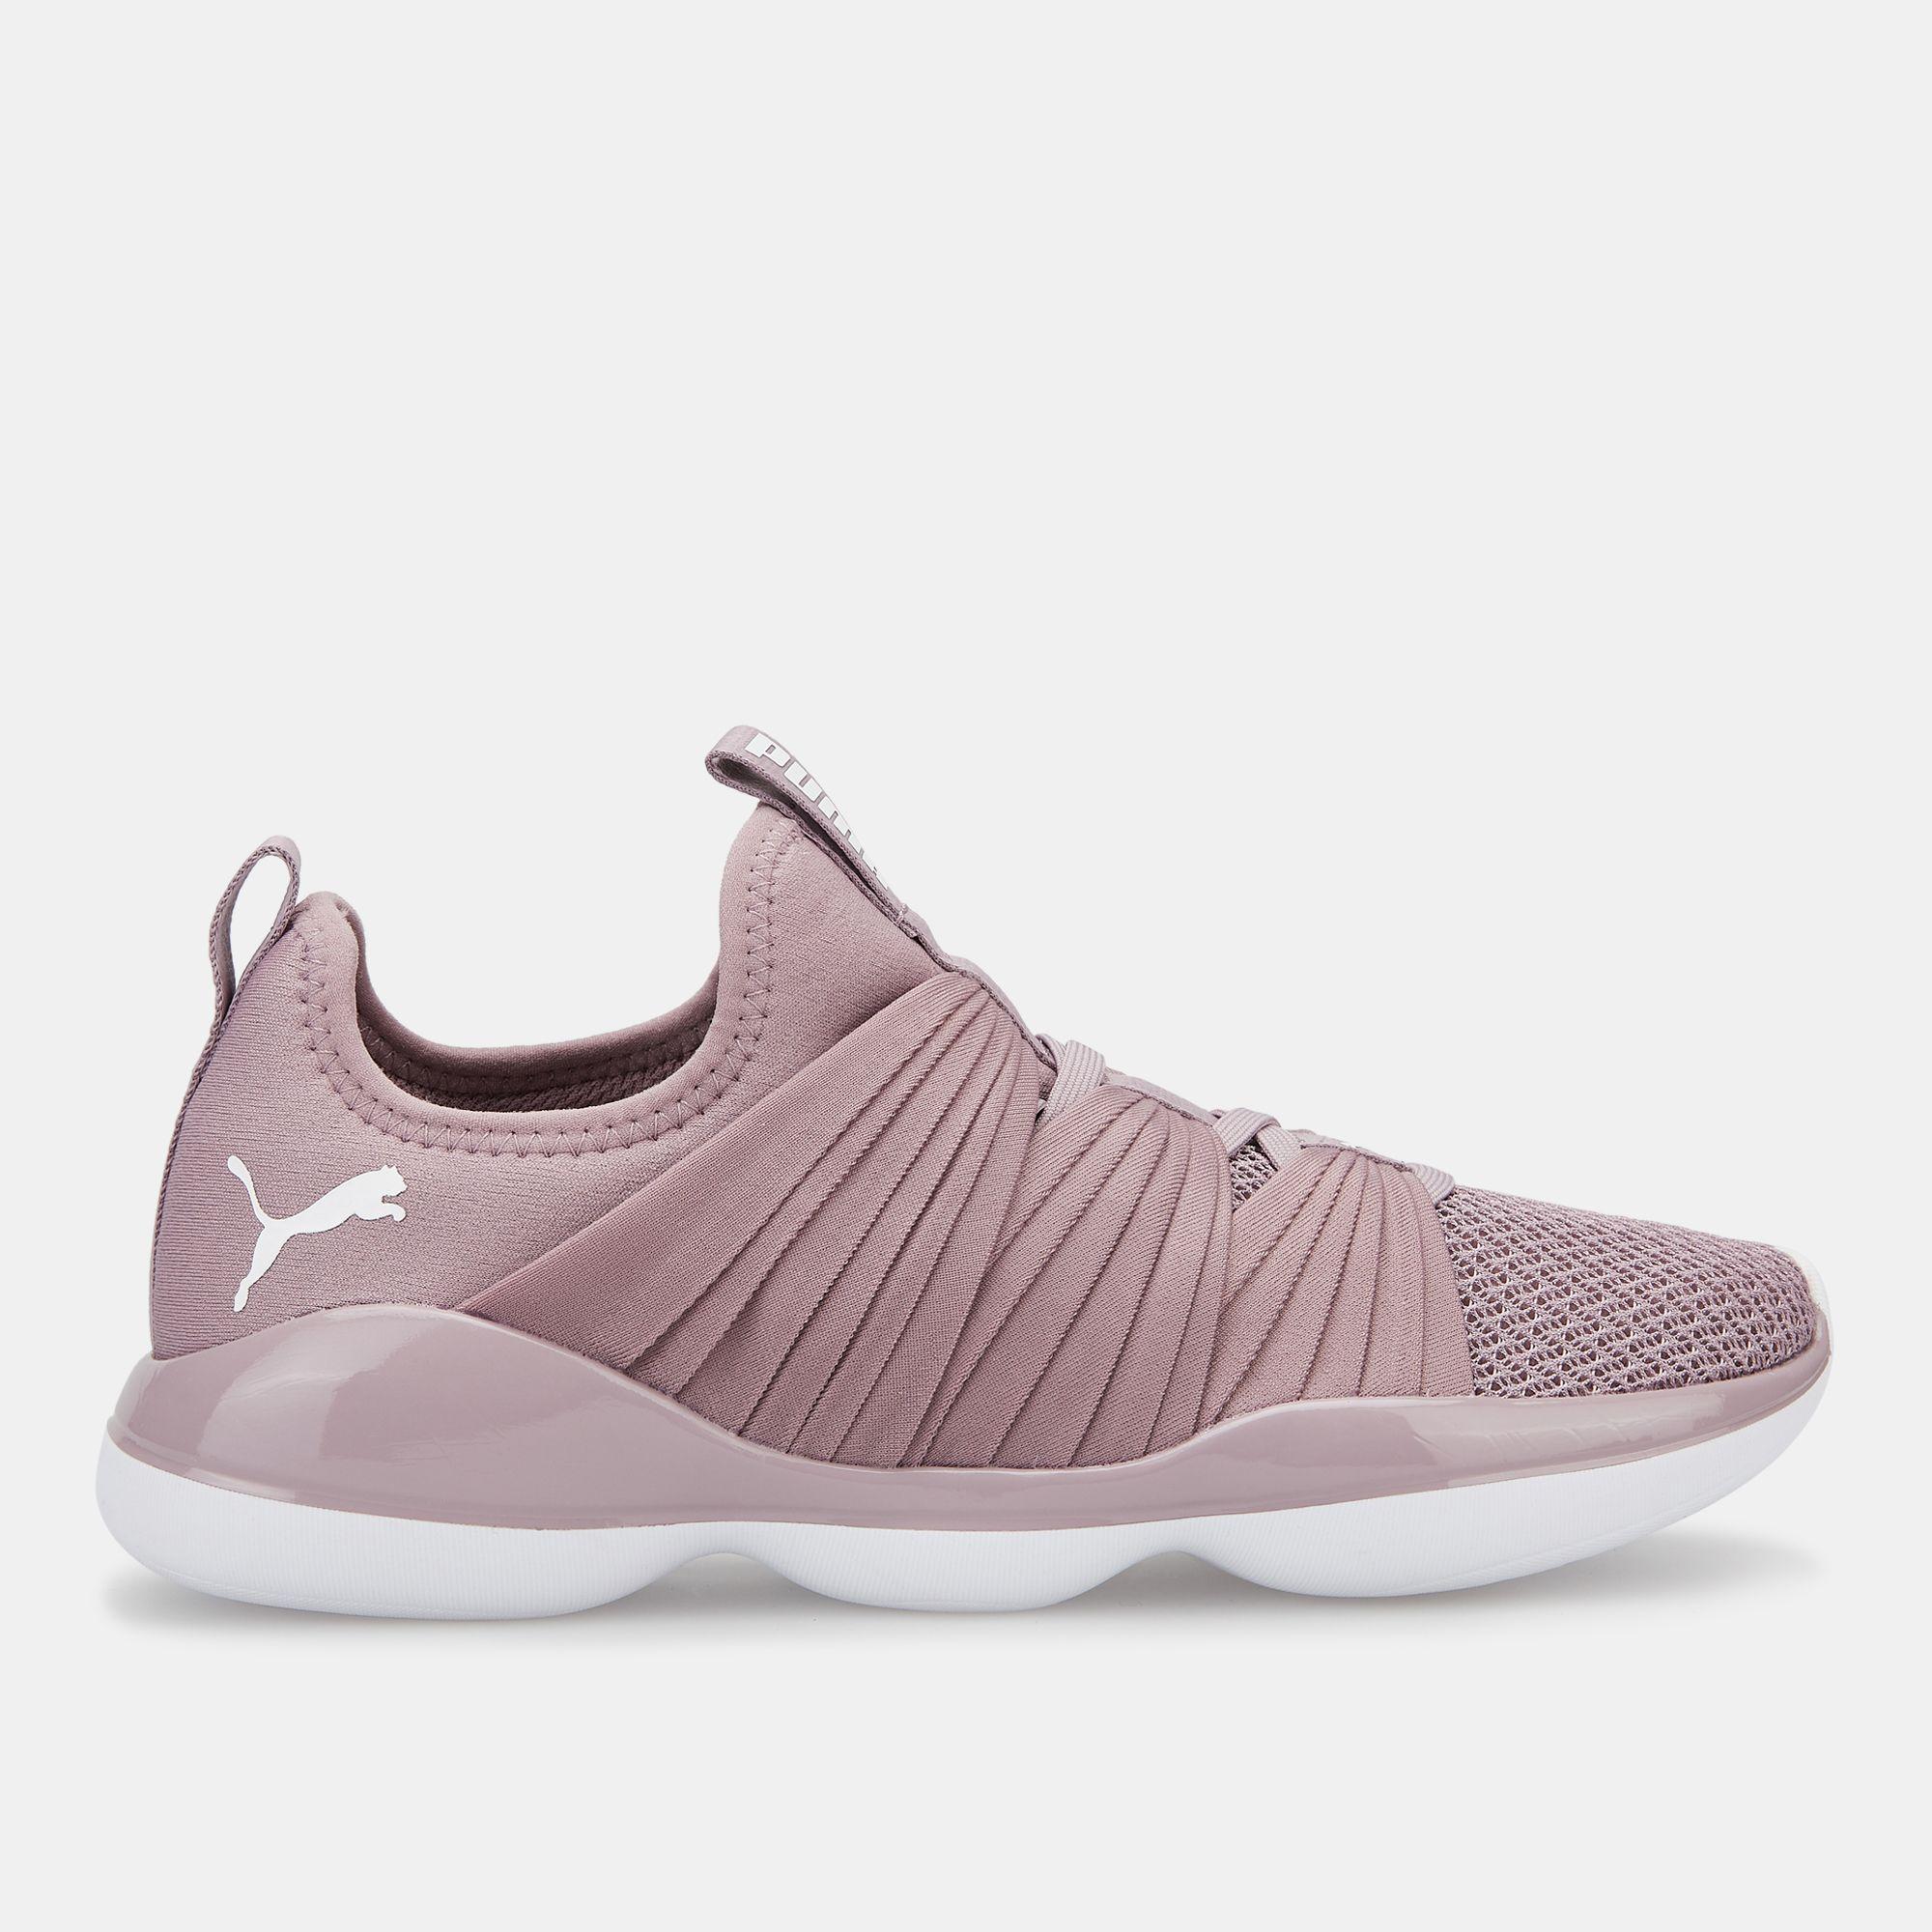 PUMA Womens Flourish Sneaker